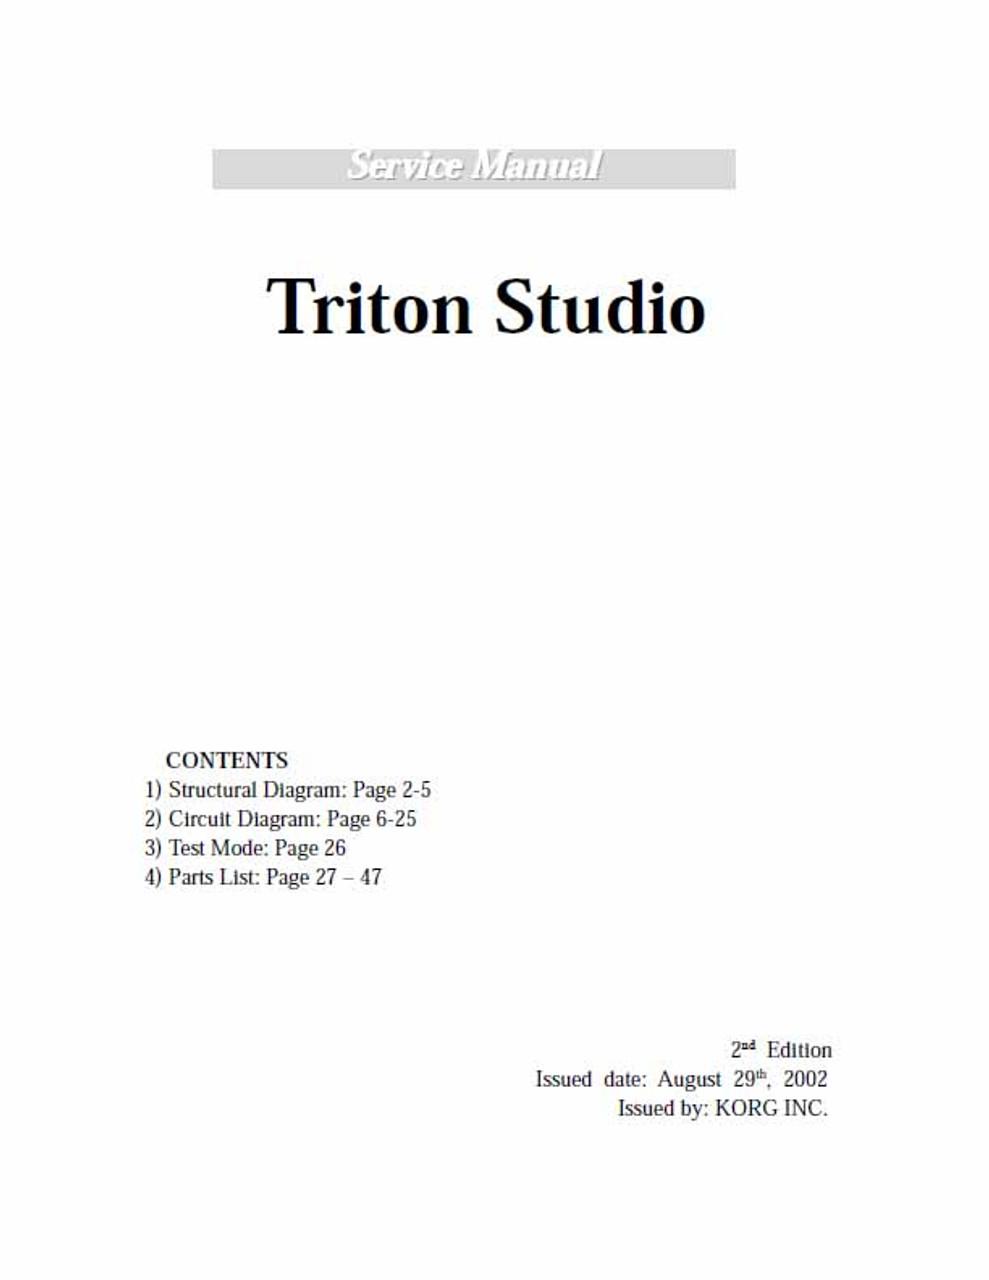 Korg Triton Studio Service Manual